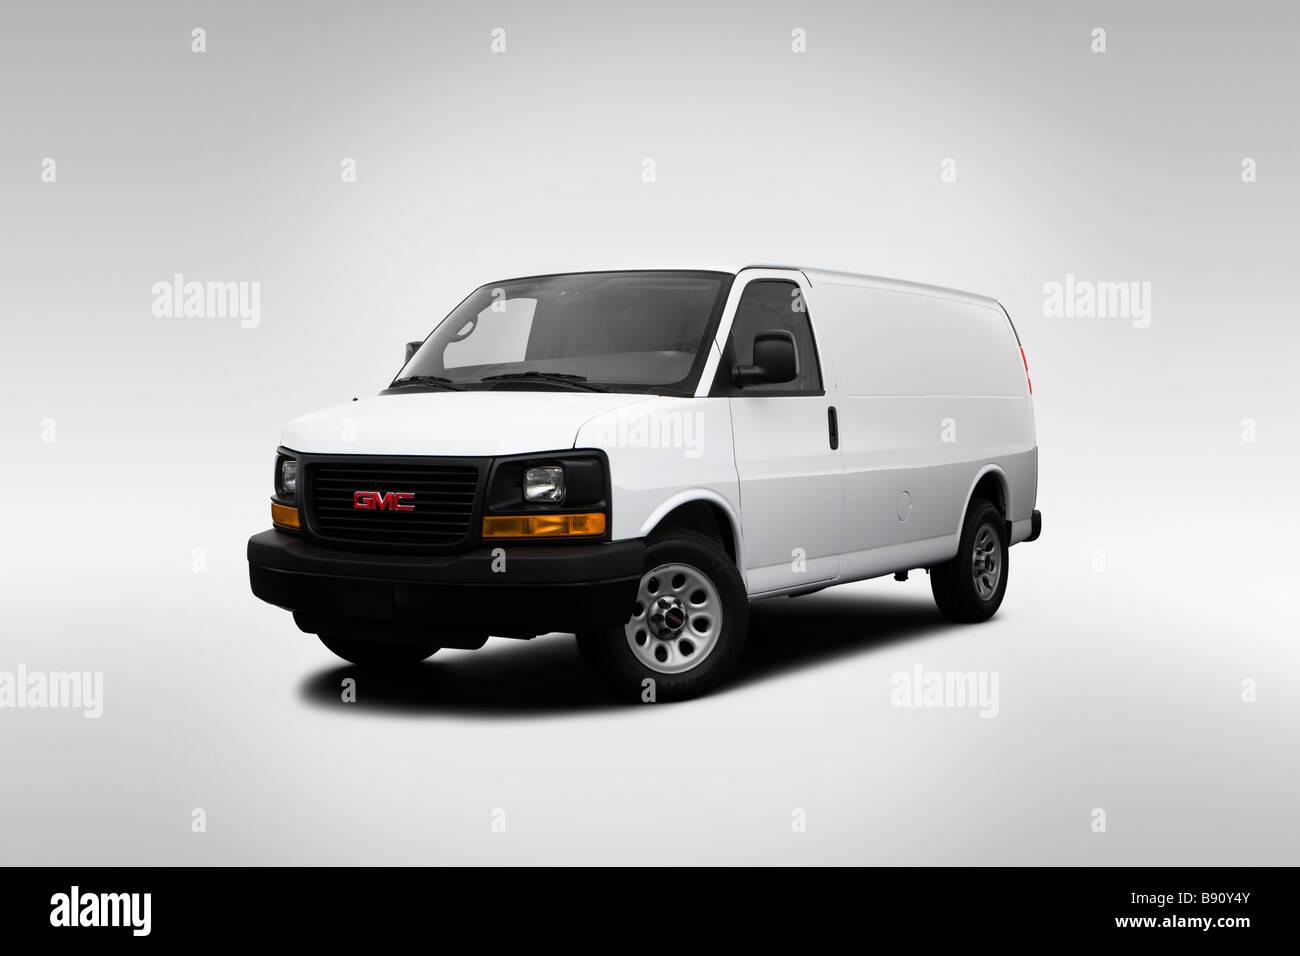 2009 GMC Savana Cargo 1500 Work Van in White - Front angle view - Stock Image